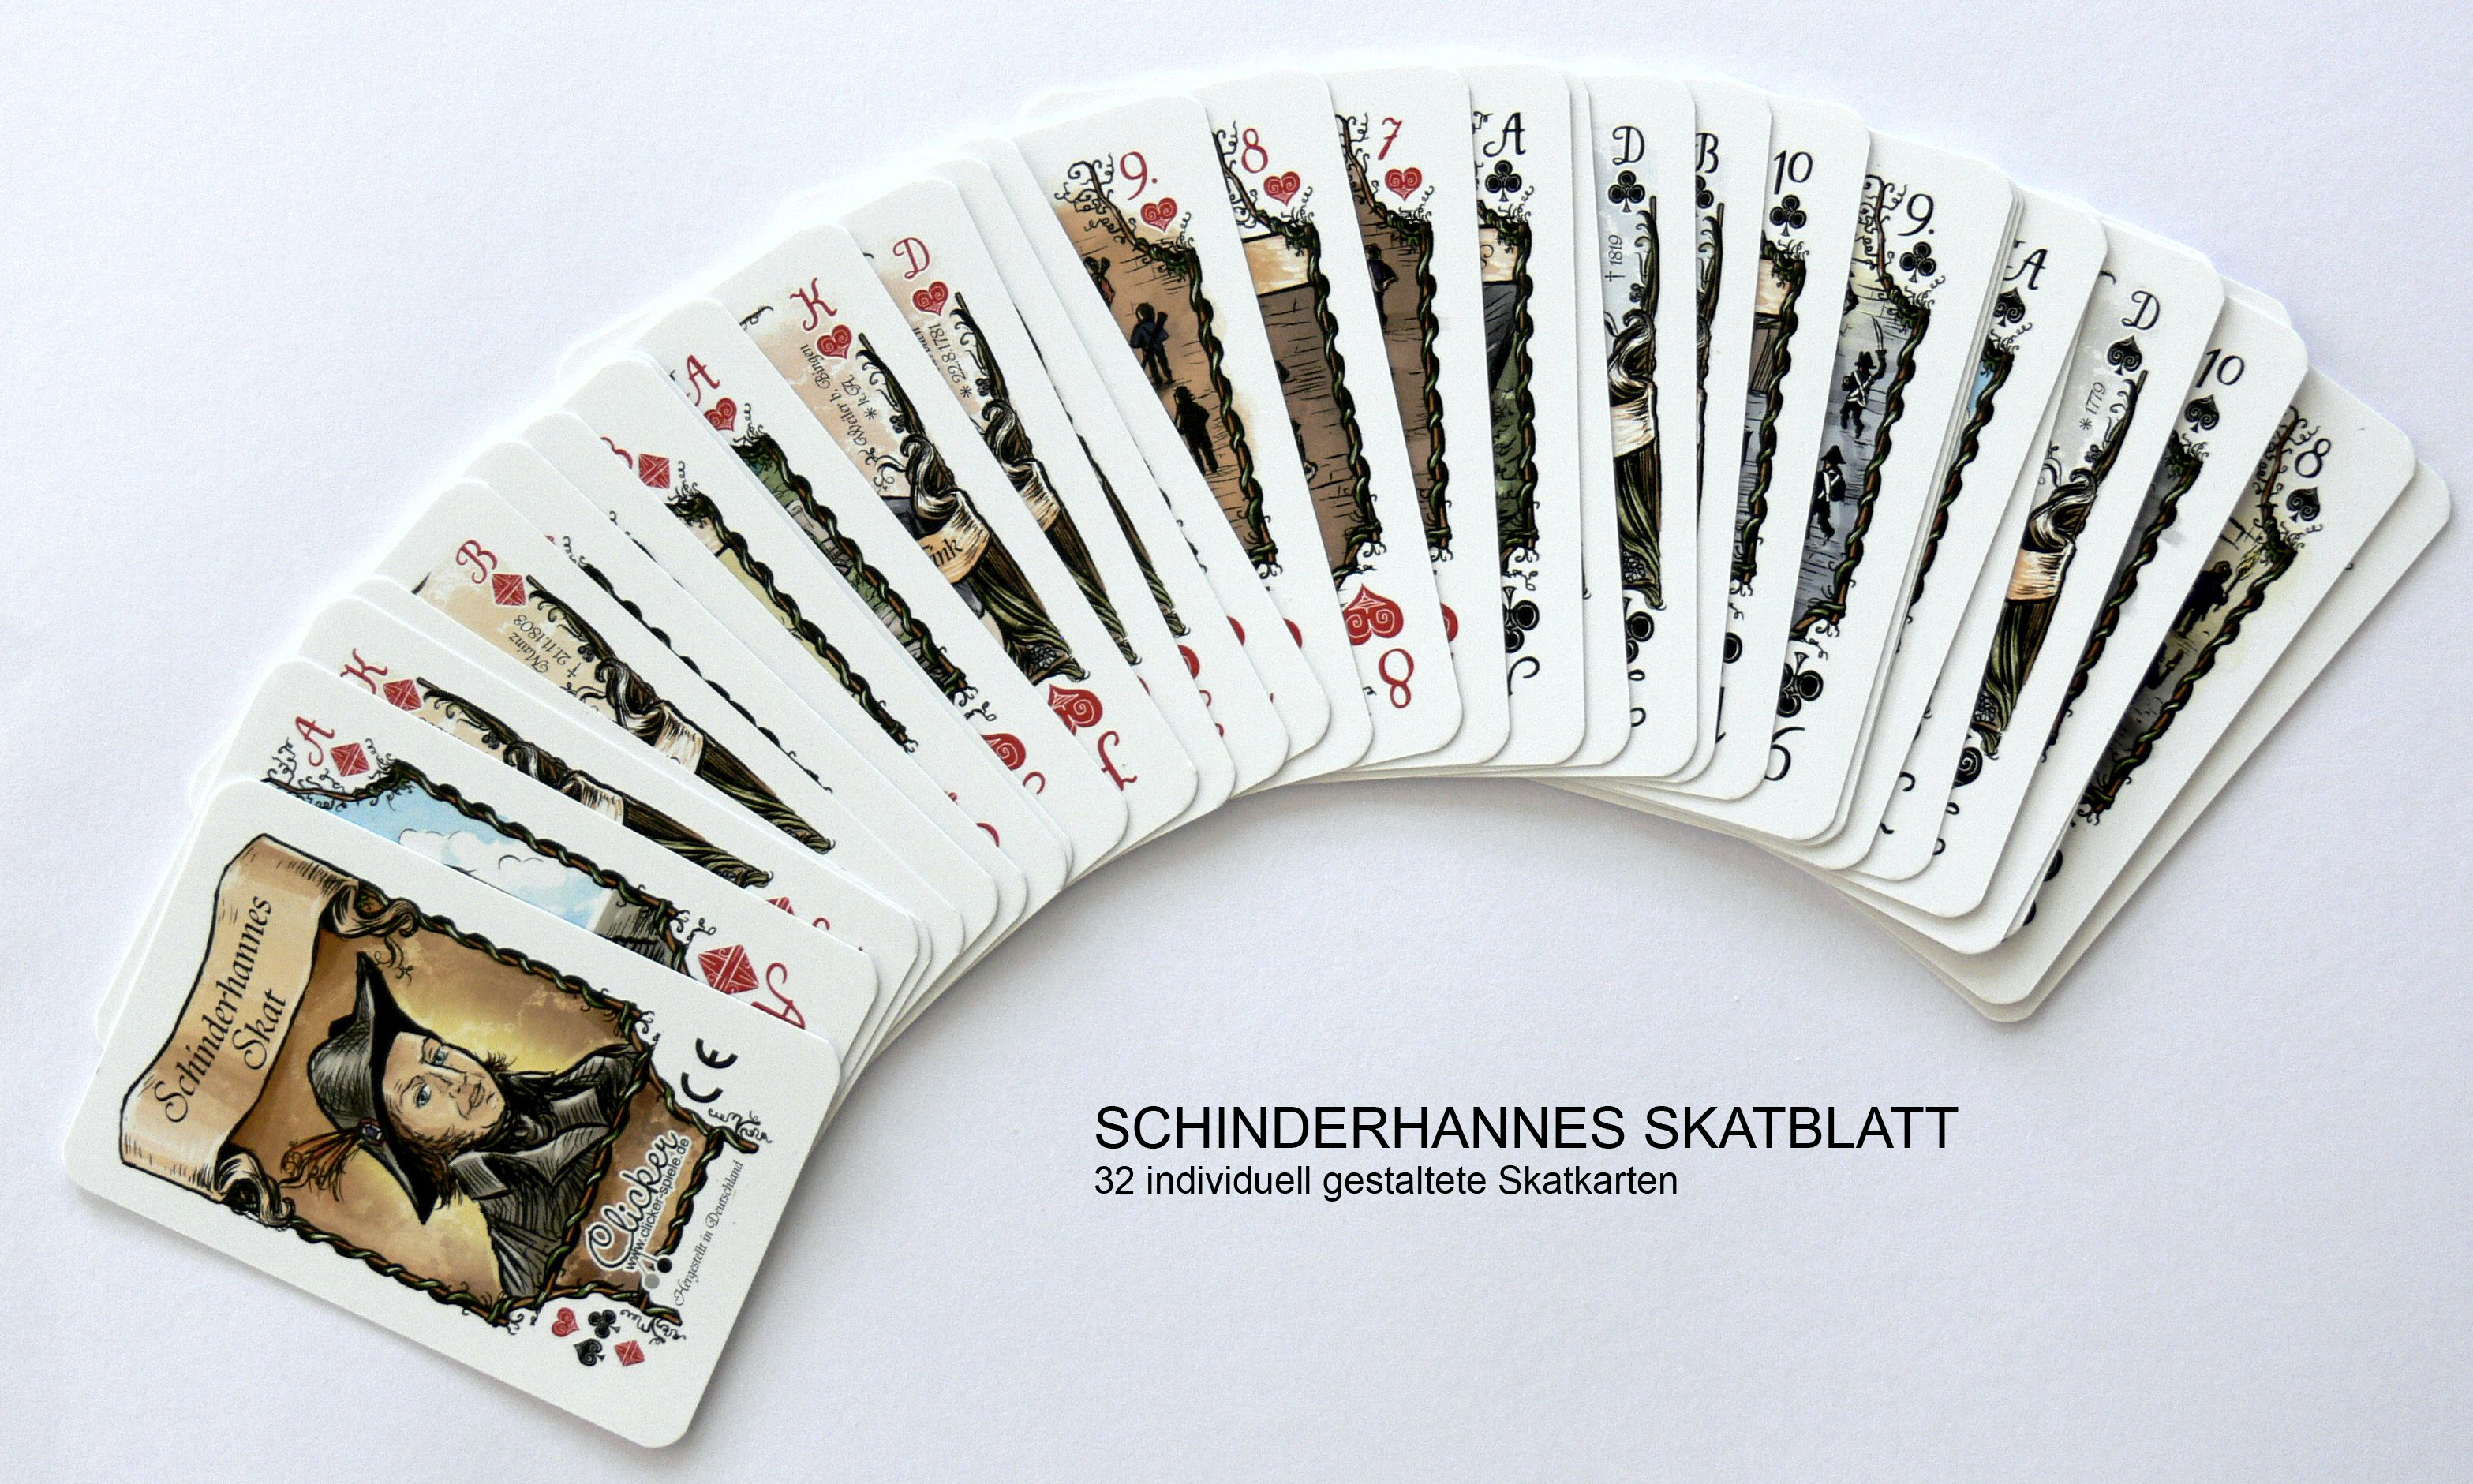 Schinderhannes Skatblatt